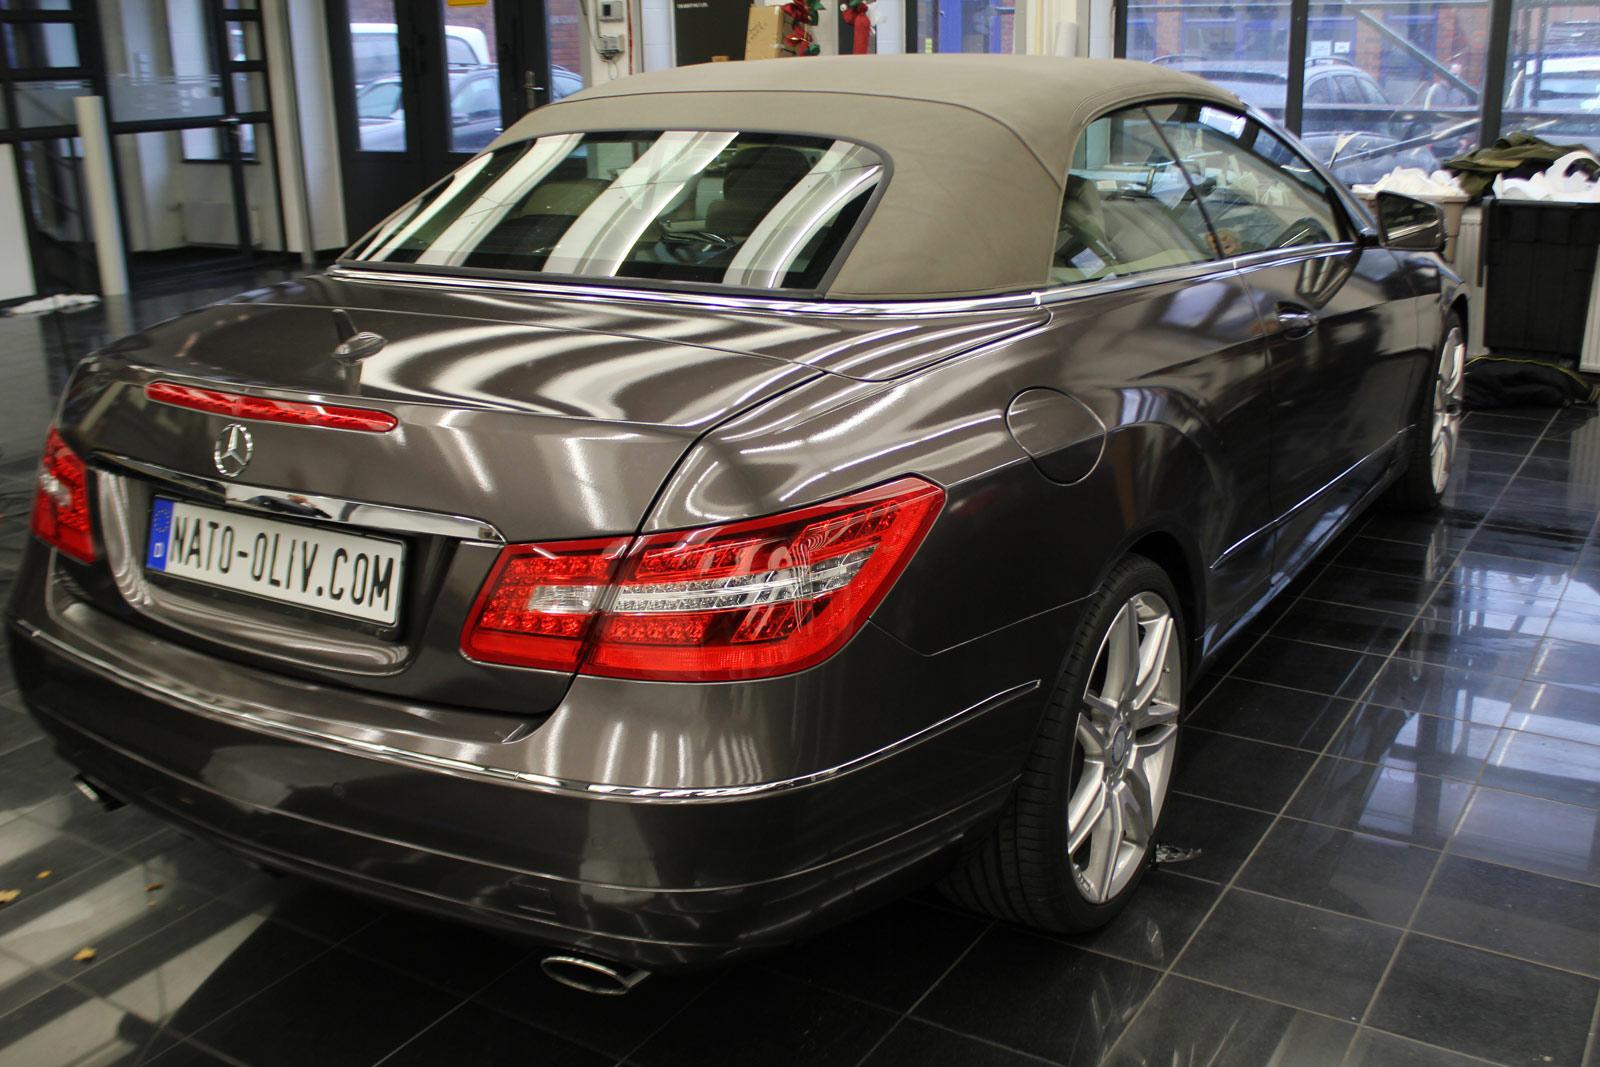 Mercedes_E-Klasse_Cabrio_Folierung_Stannitgrau_Metallic_Glanz_34